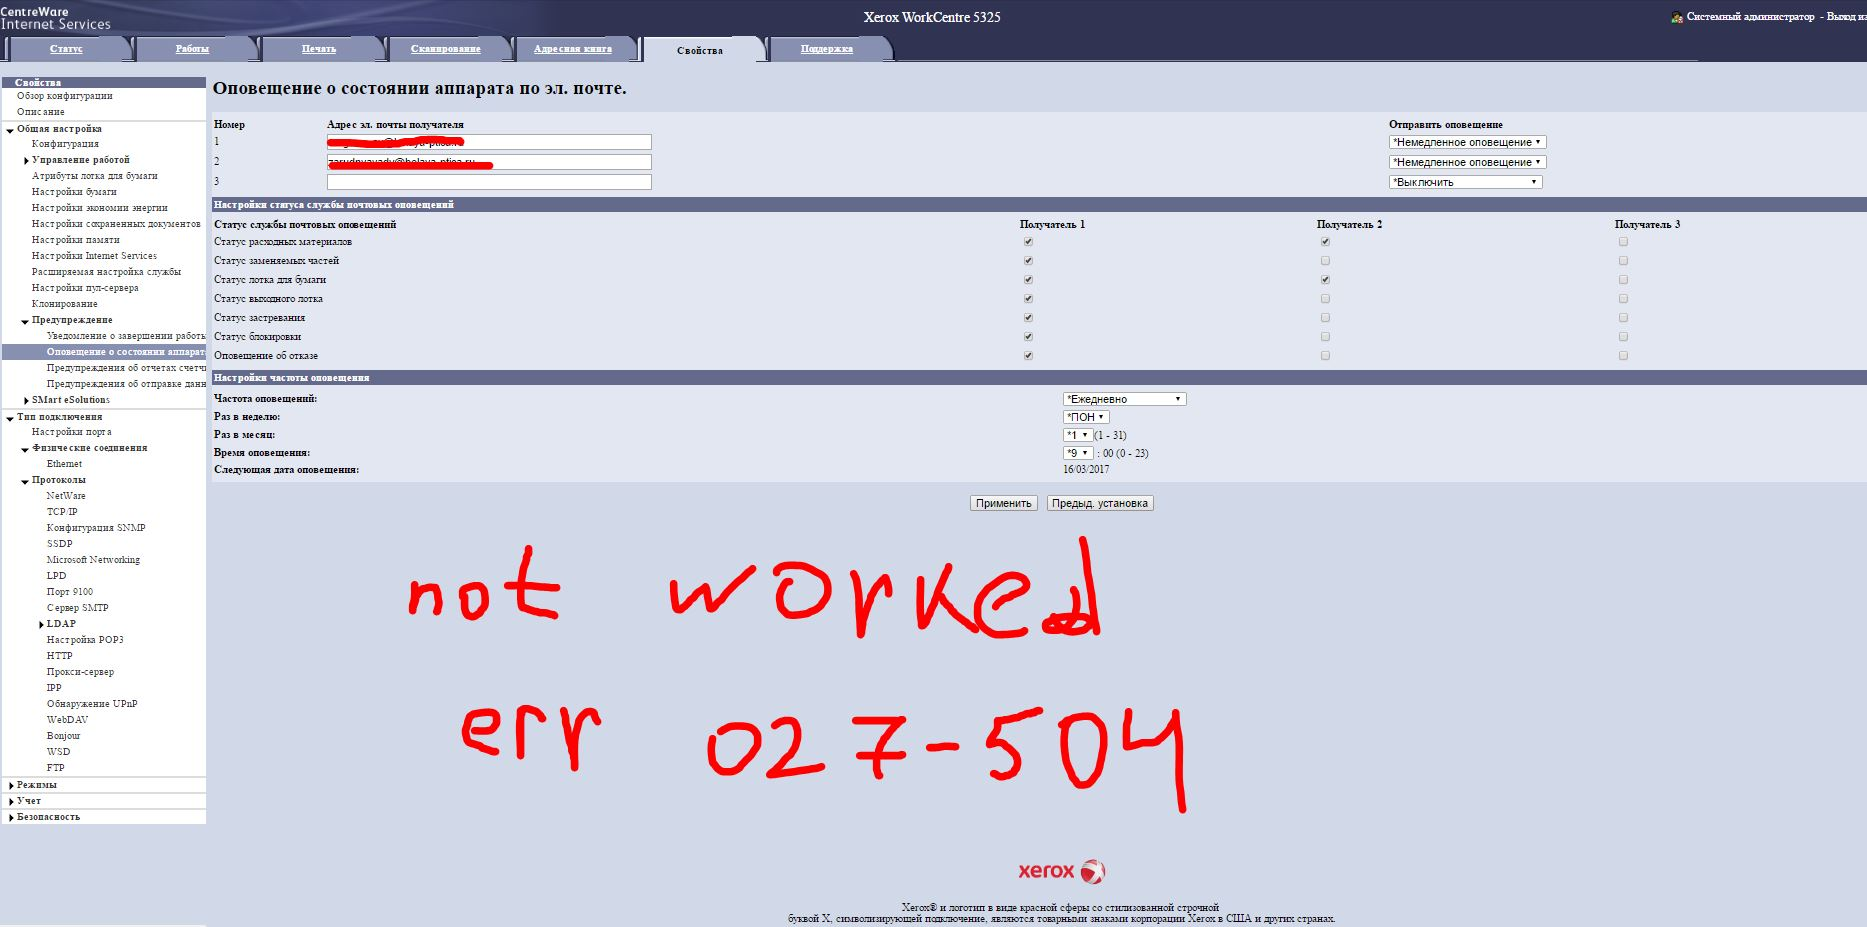 Xerox 5325 Error 027 504 Customer Support Forum